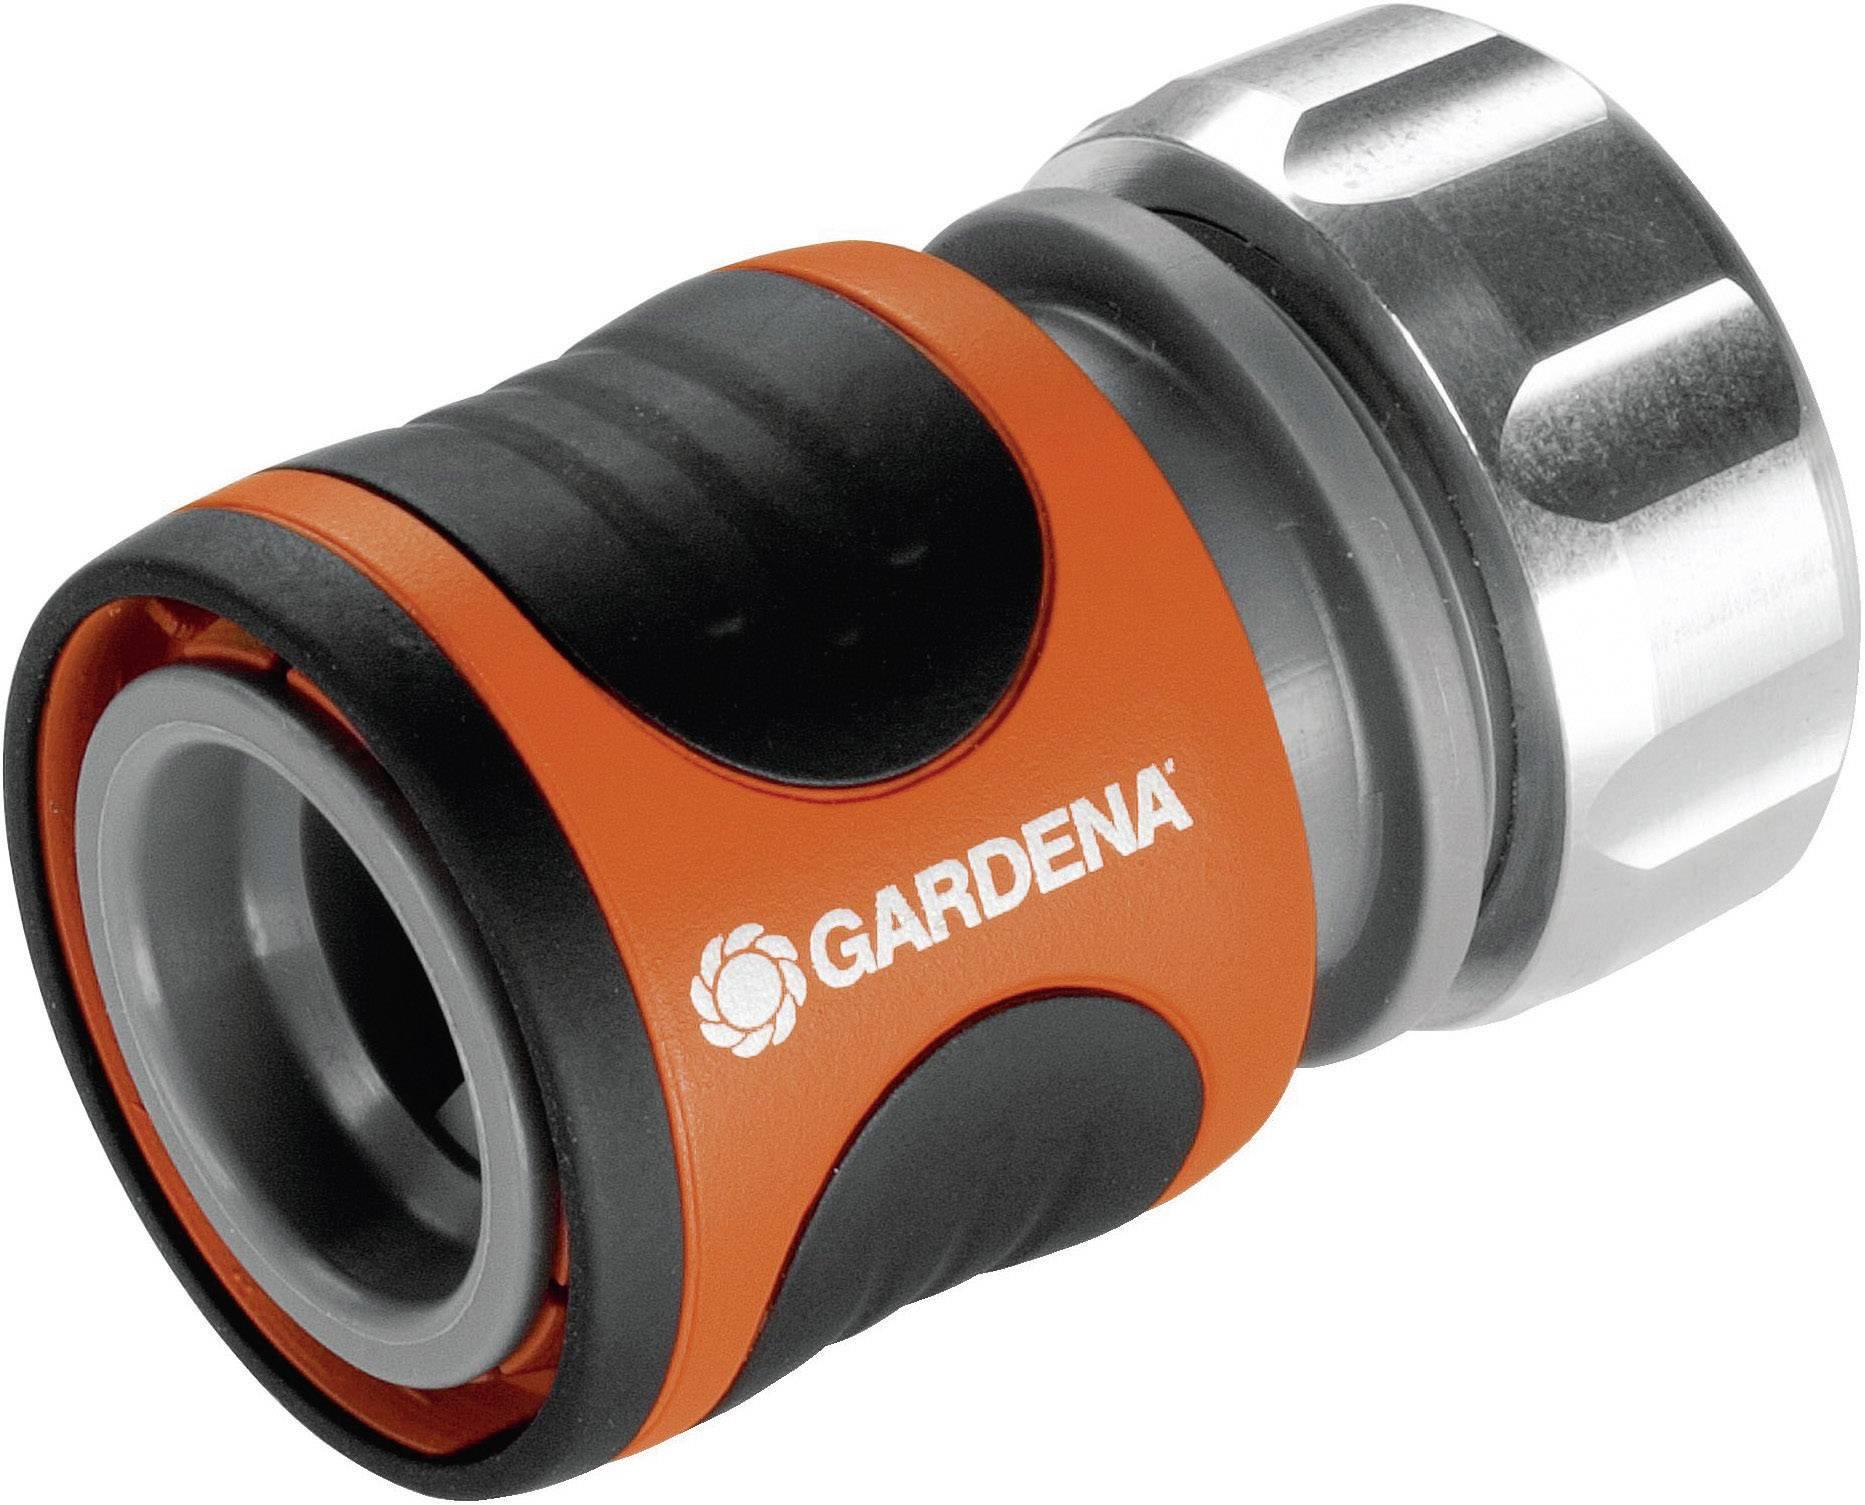 "Stopspojka Gardena Premium 13 mm (1/2 "")"